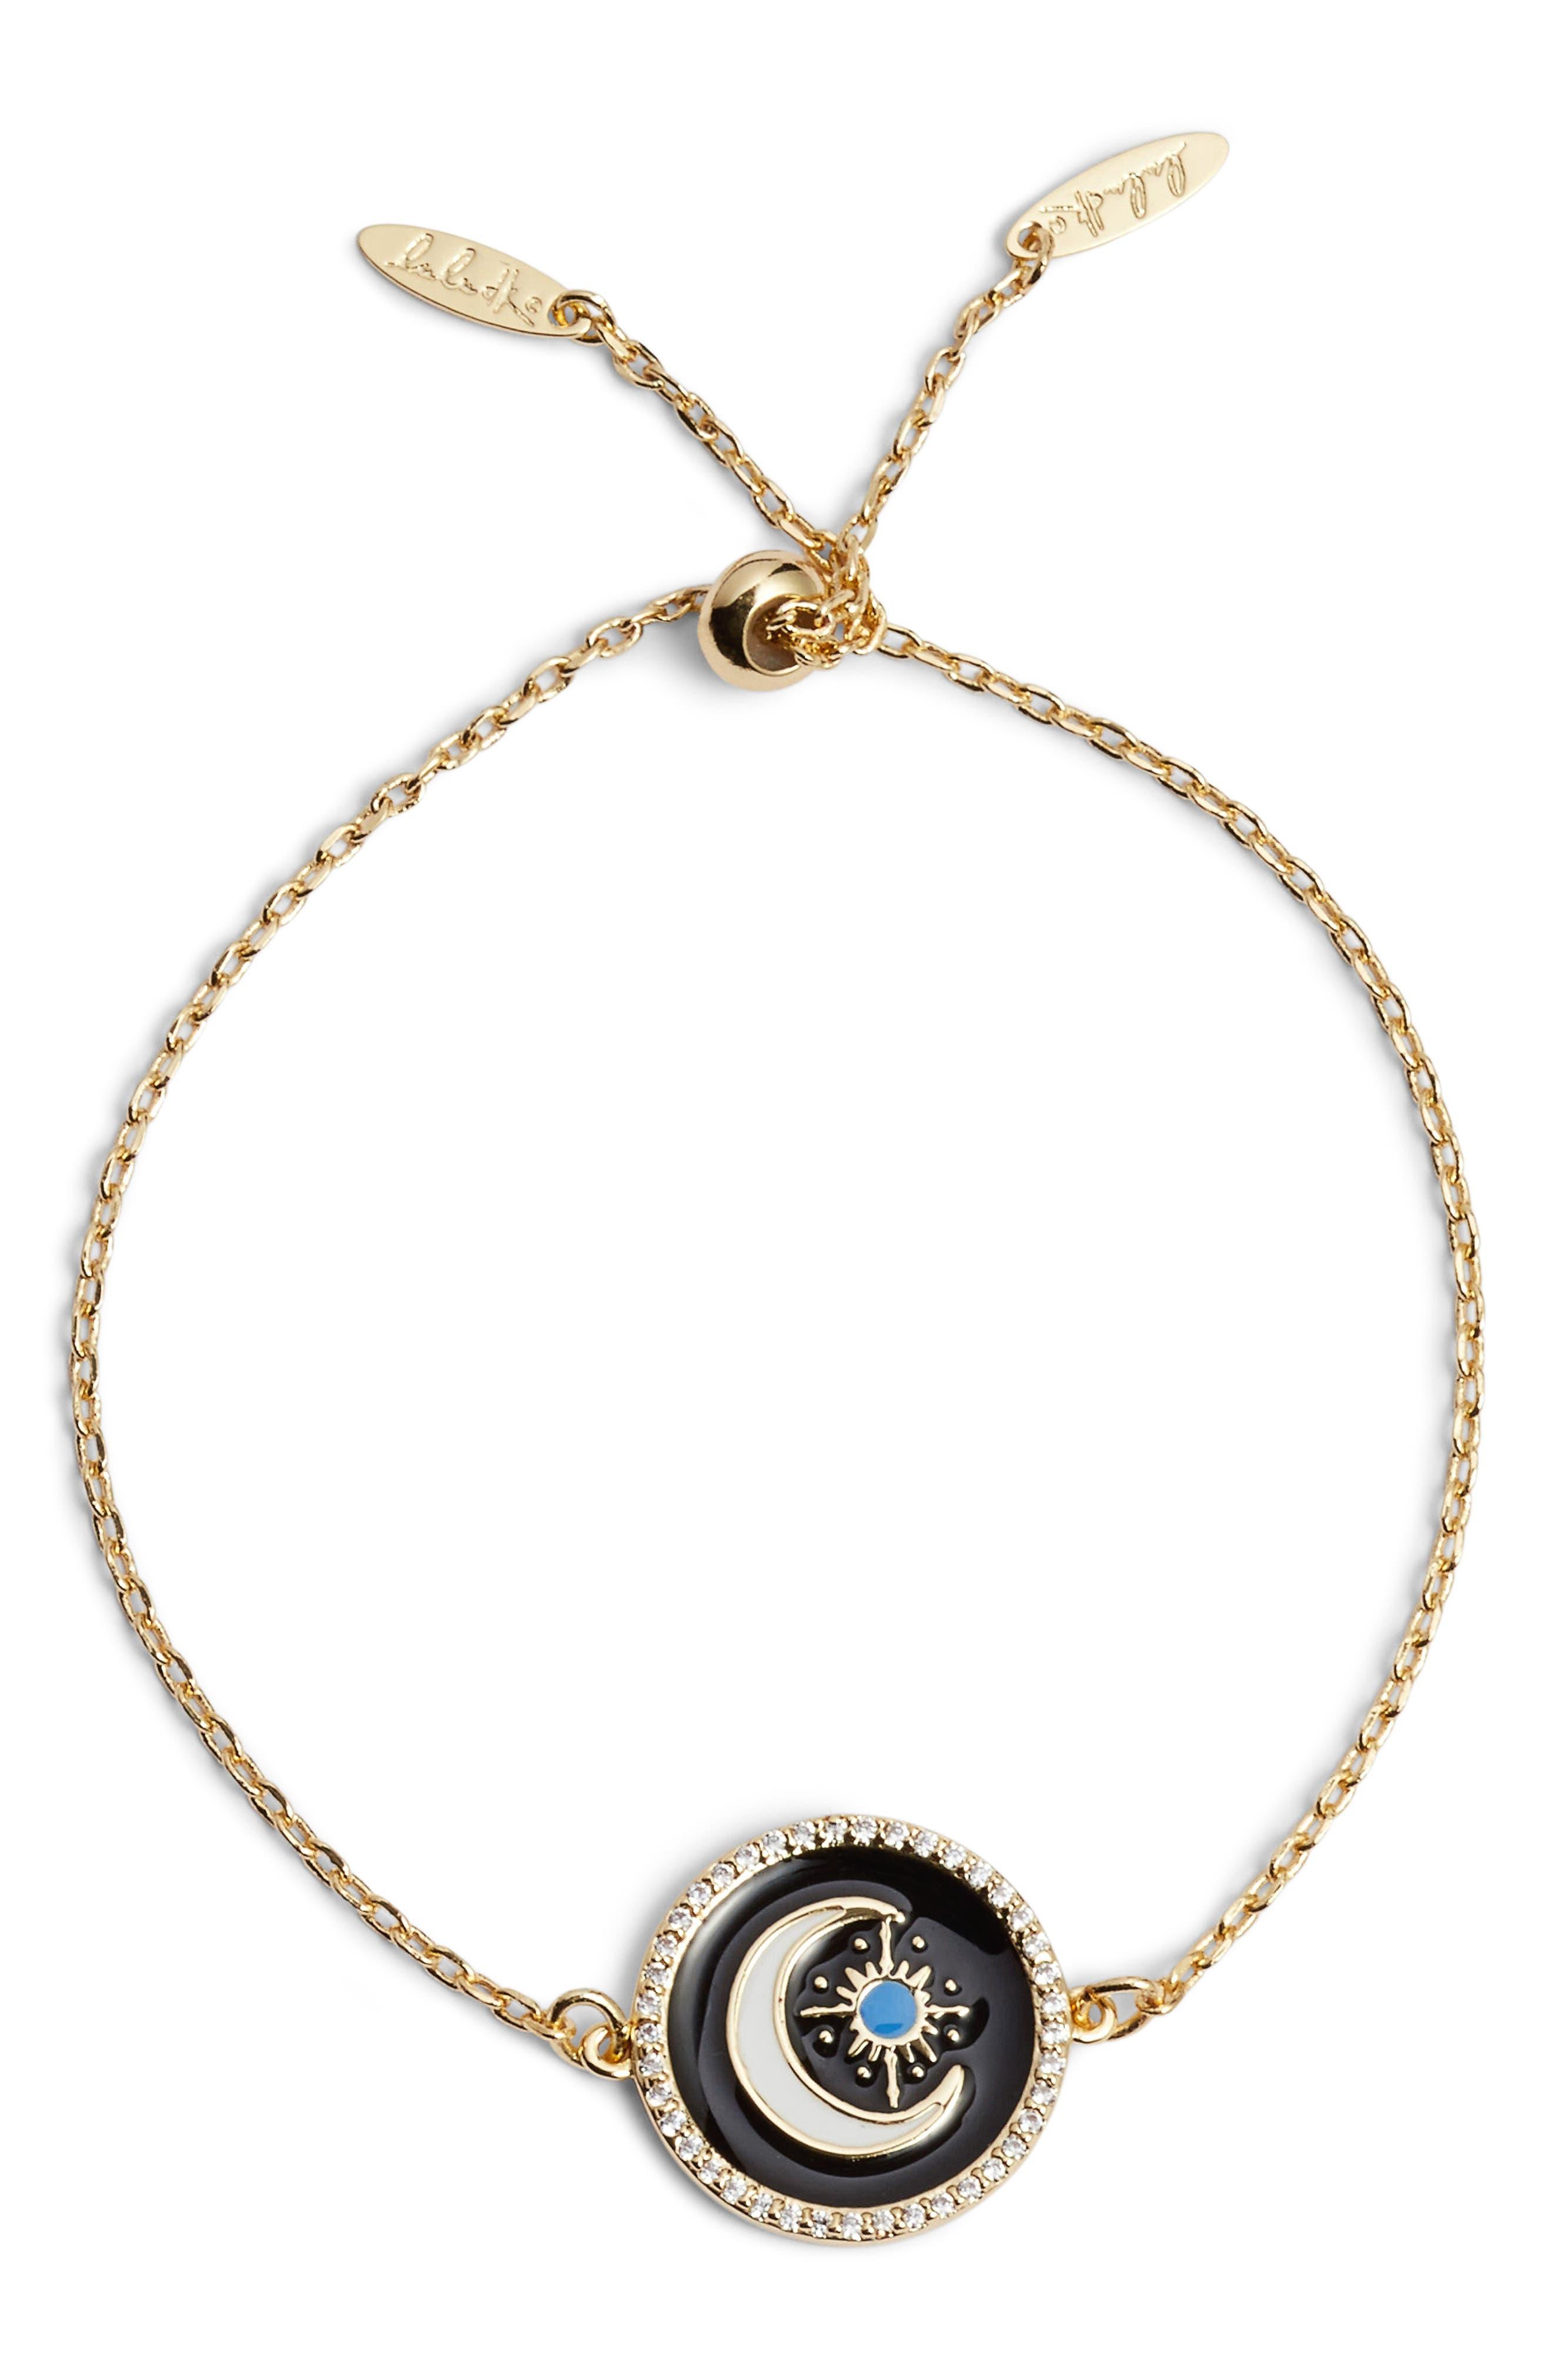 Main Image - Lulu DK Follow Your Dreams Pendant Bracelet